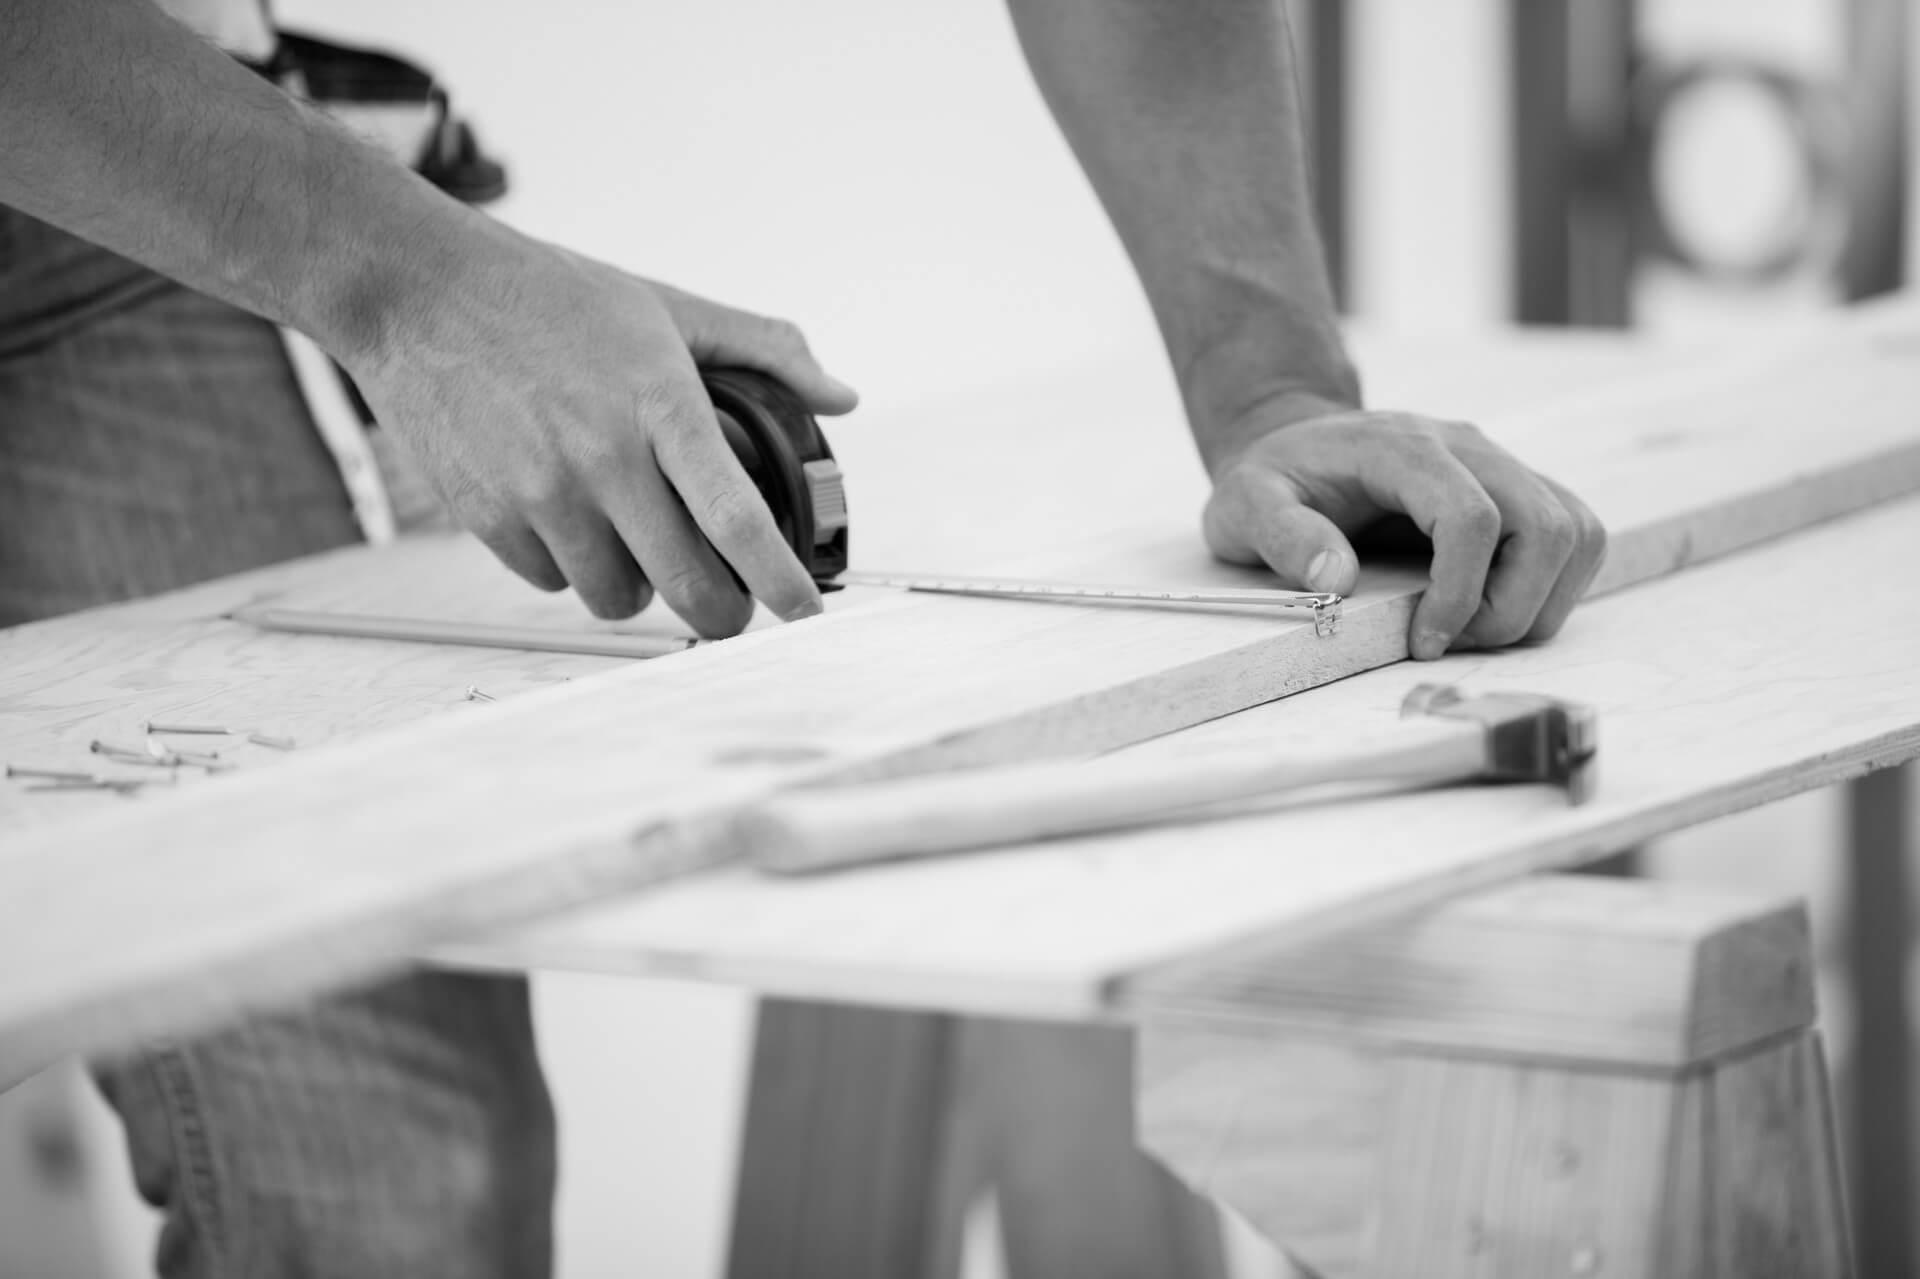 stavebna-spolocnost-tbau-hruba-stavba-stavebne-prace (11)